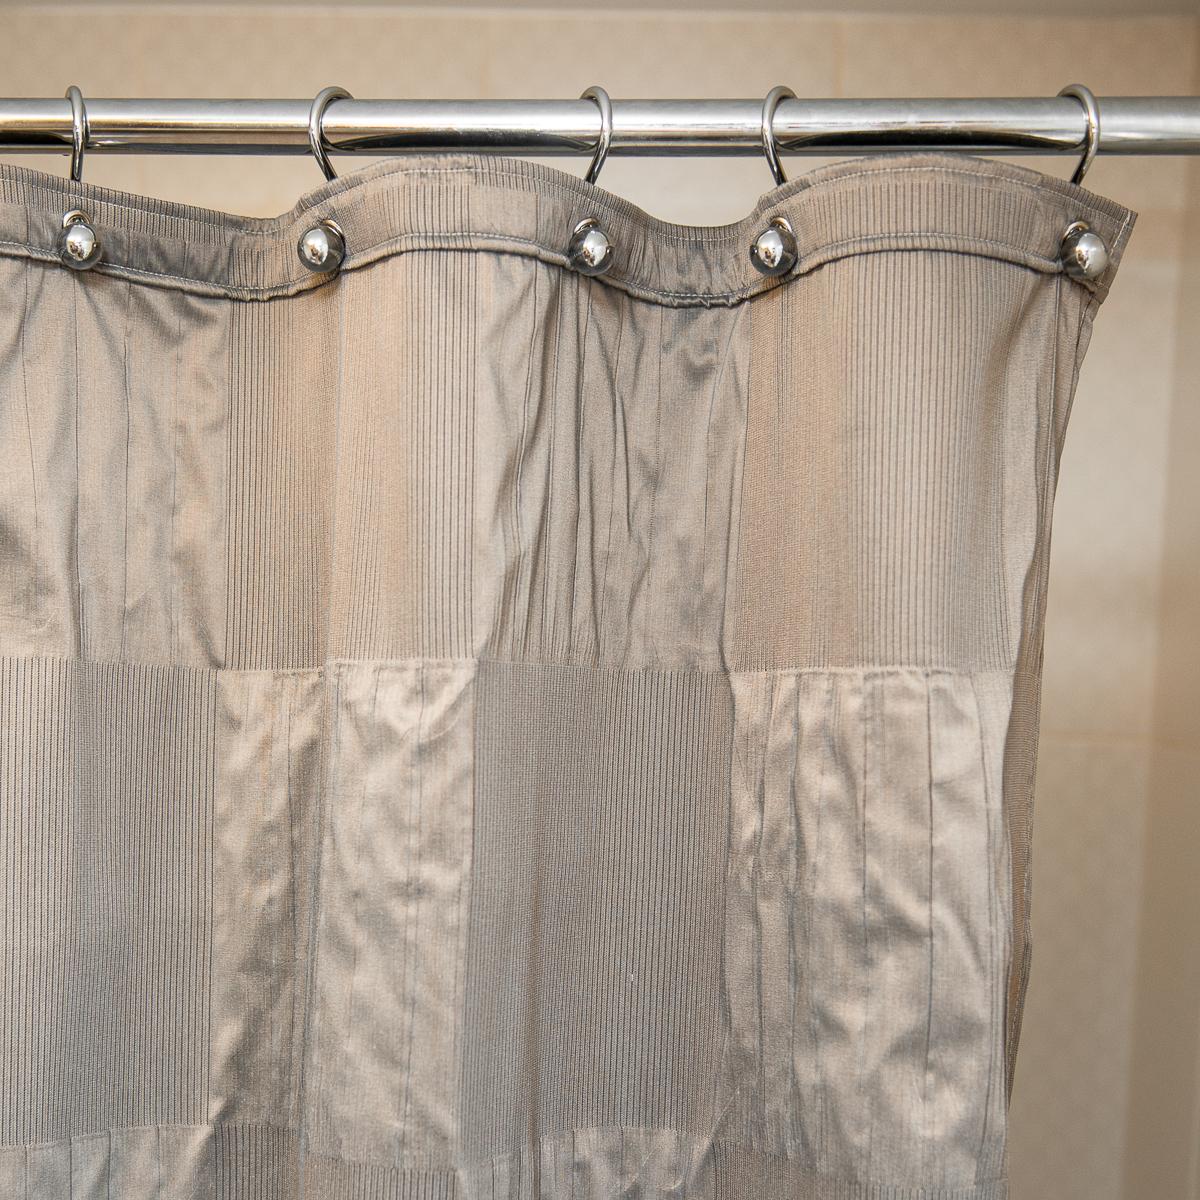 Шторки Элитная шторка для ванной 240х200 Cairo Blance + Liso White от Arti-Deco elitnaya-shtorka-dlya-vannoy-240-200-cairo-blance-ot-arti-deco-ispaniya.jpg